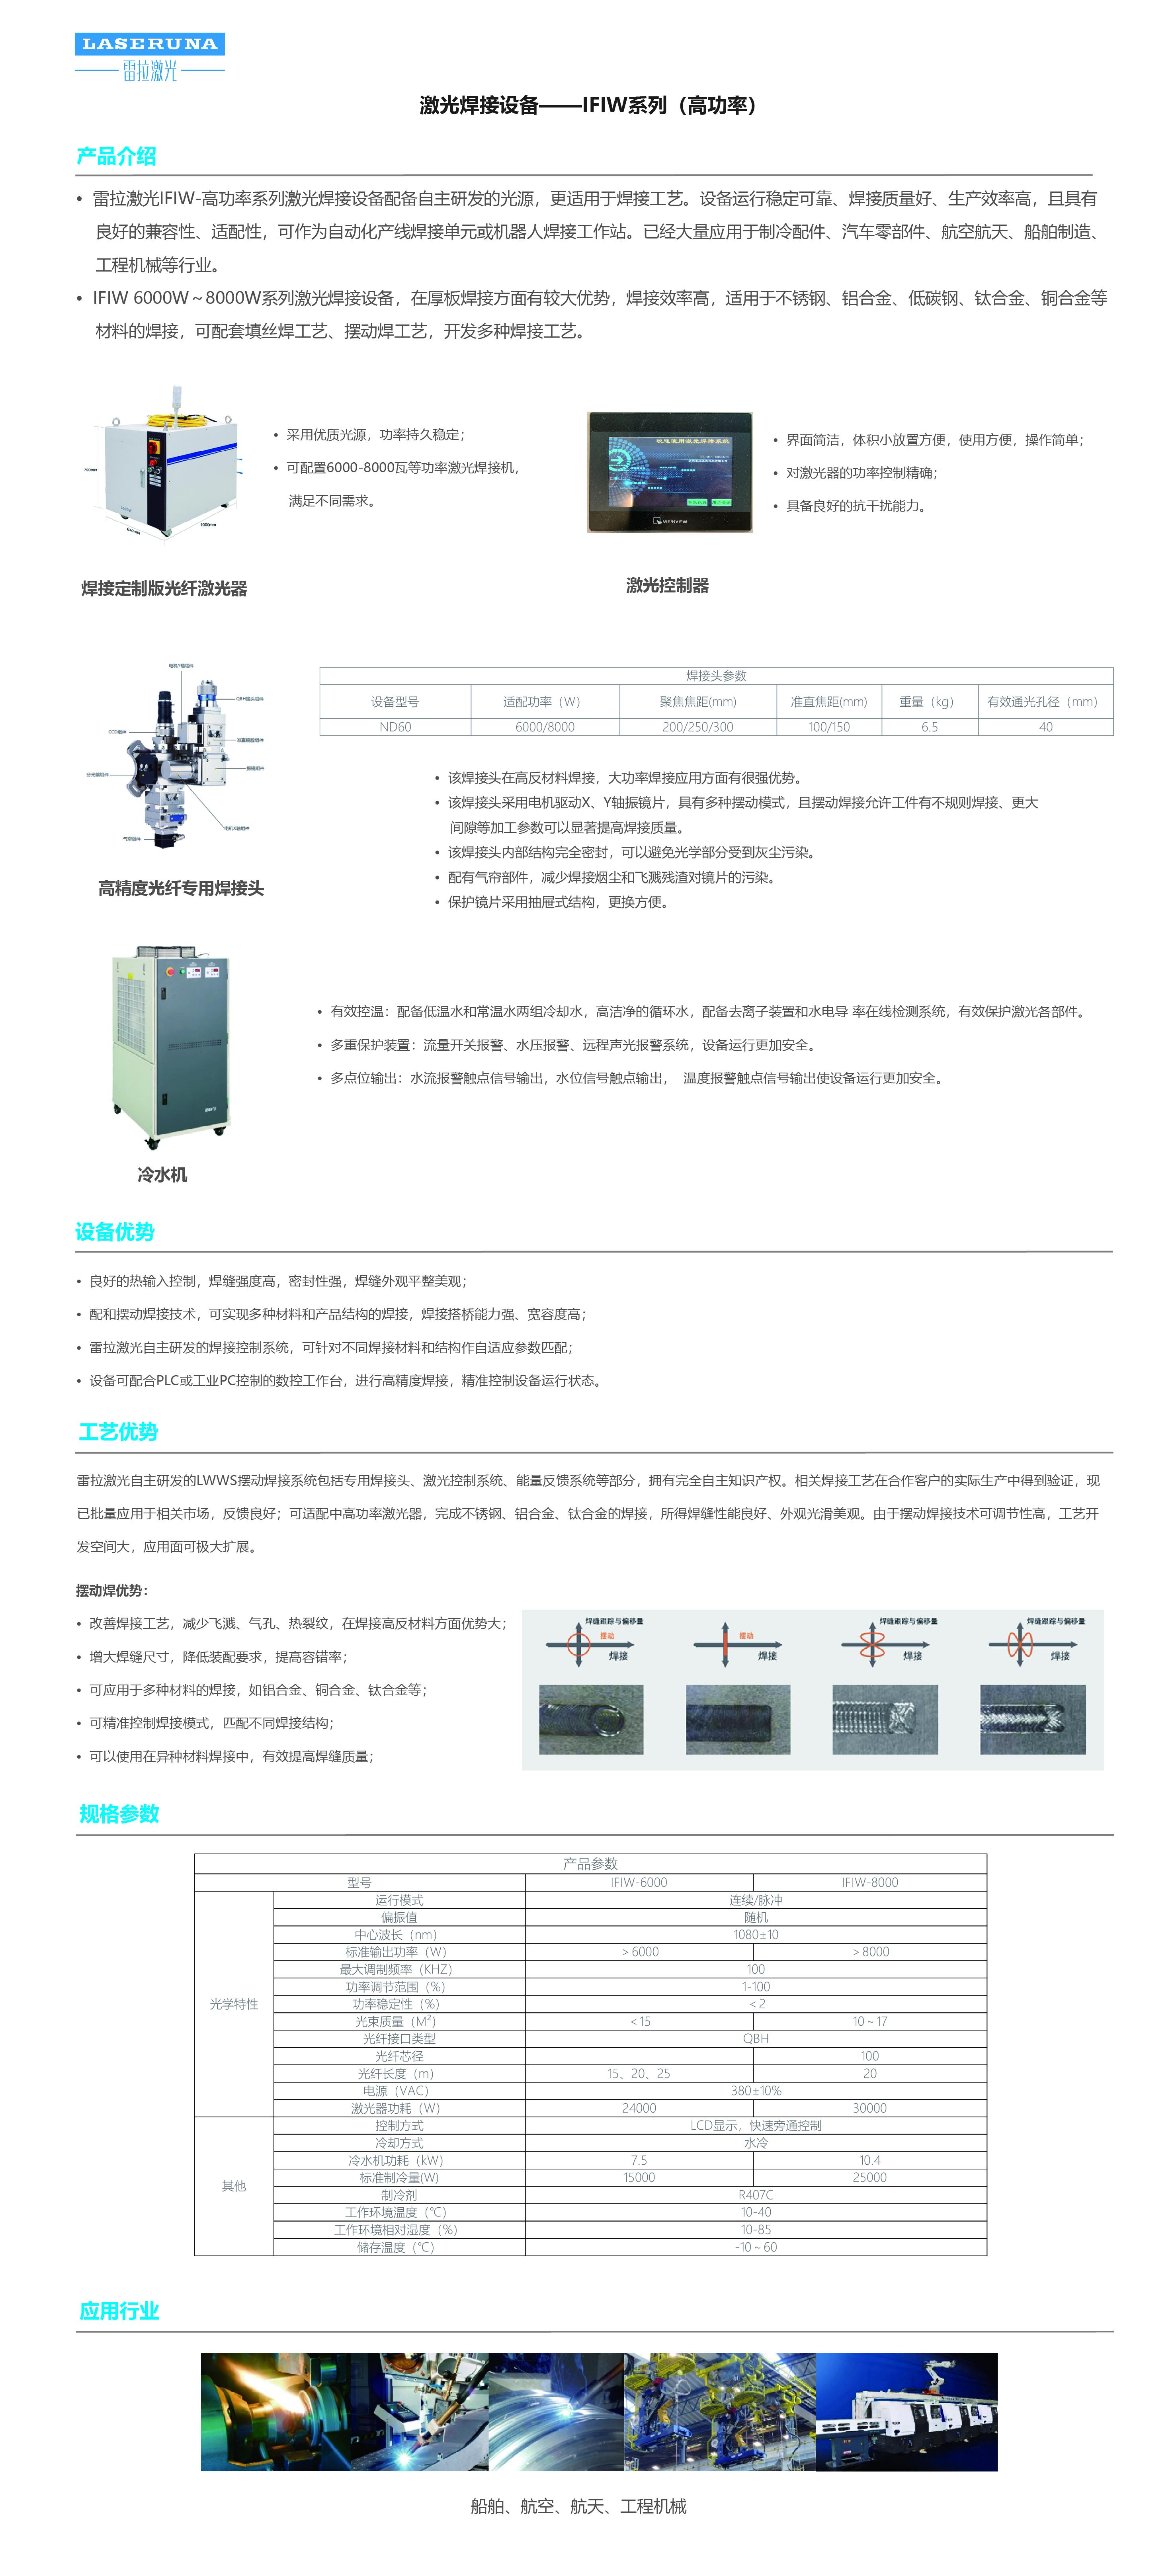 vwin ac米兰焊接设备——IFIW系列(高功率)_画板 1